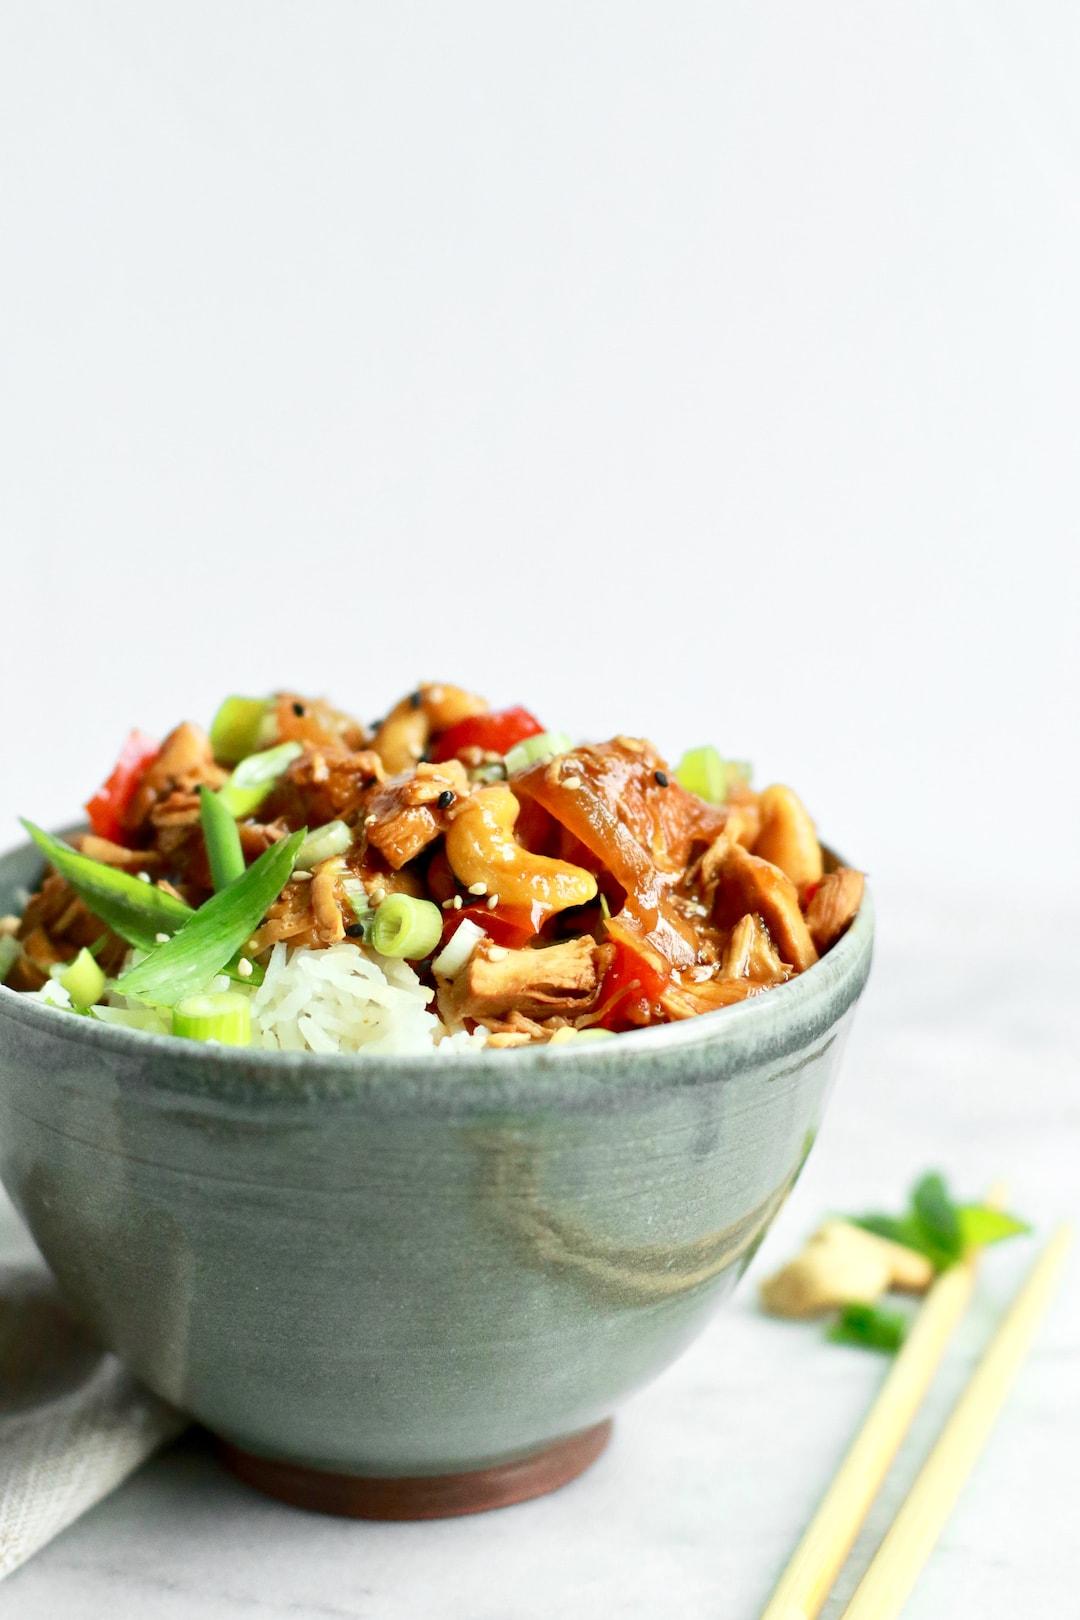 Easy Healthy Crockpot Cashew Chicken